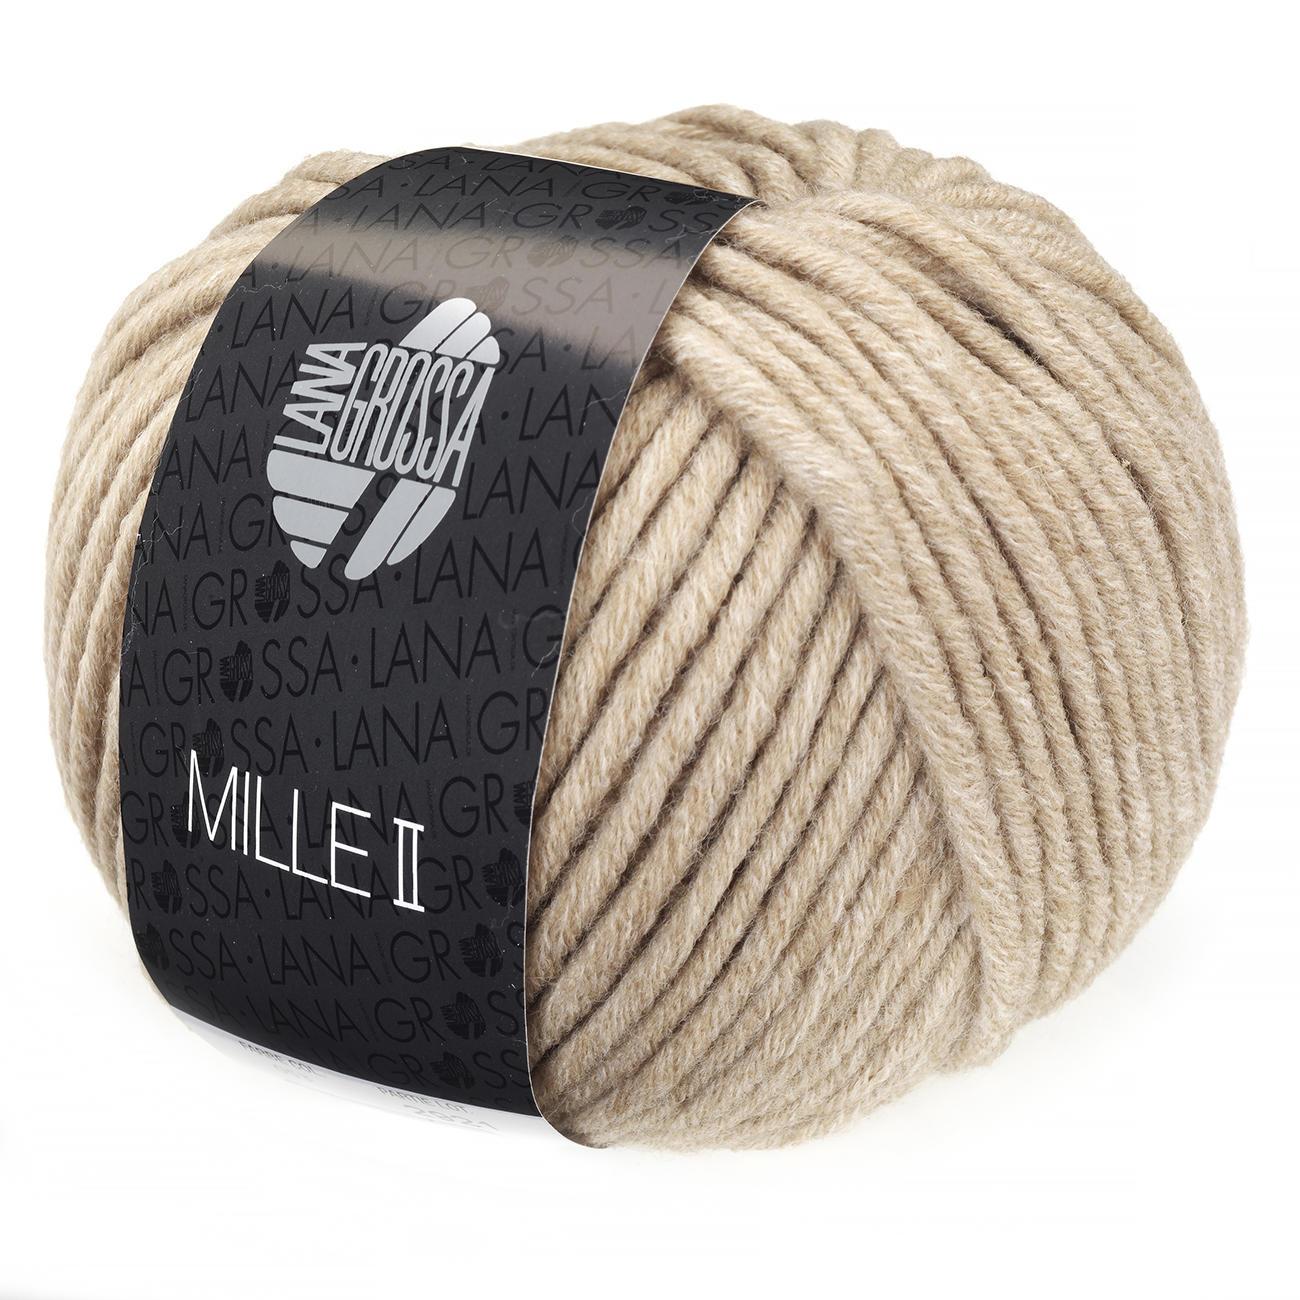 Mille II Fb 80 loden 50 g Lana Grossa Wolle Kreativ